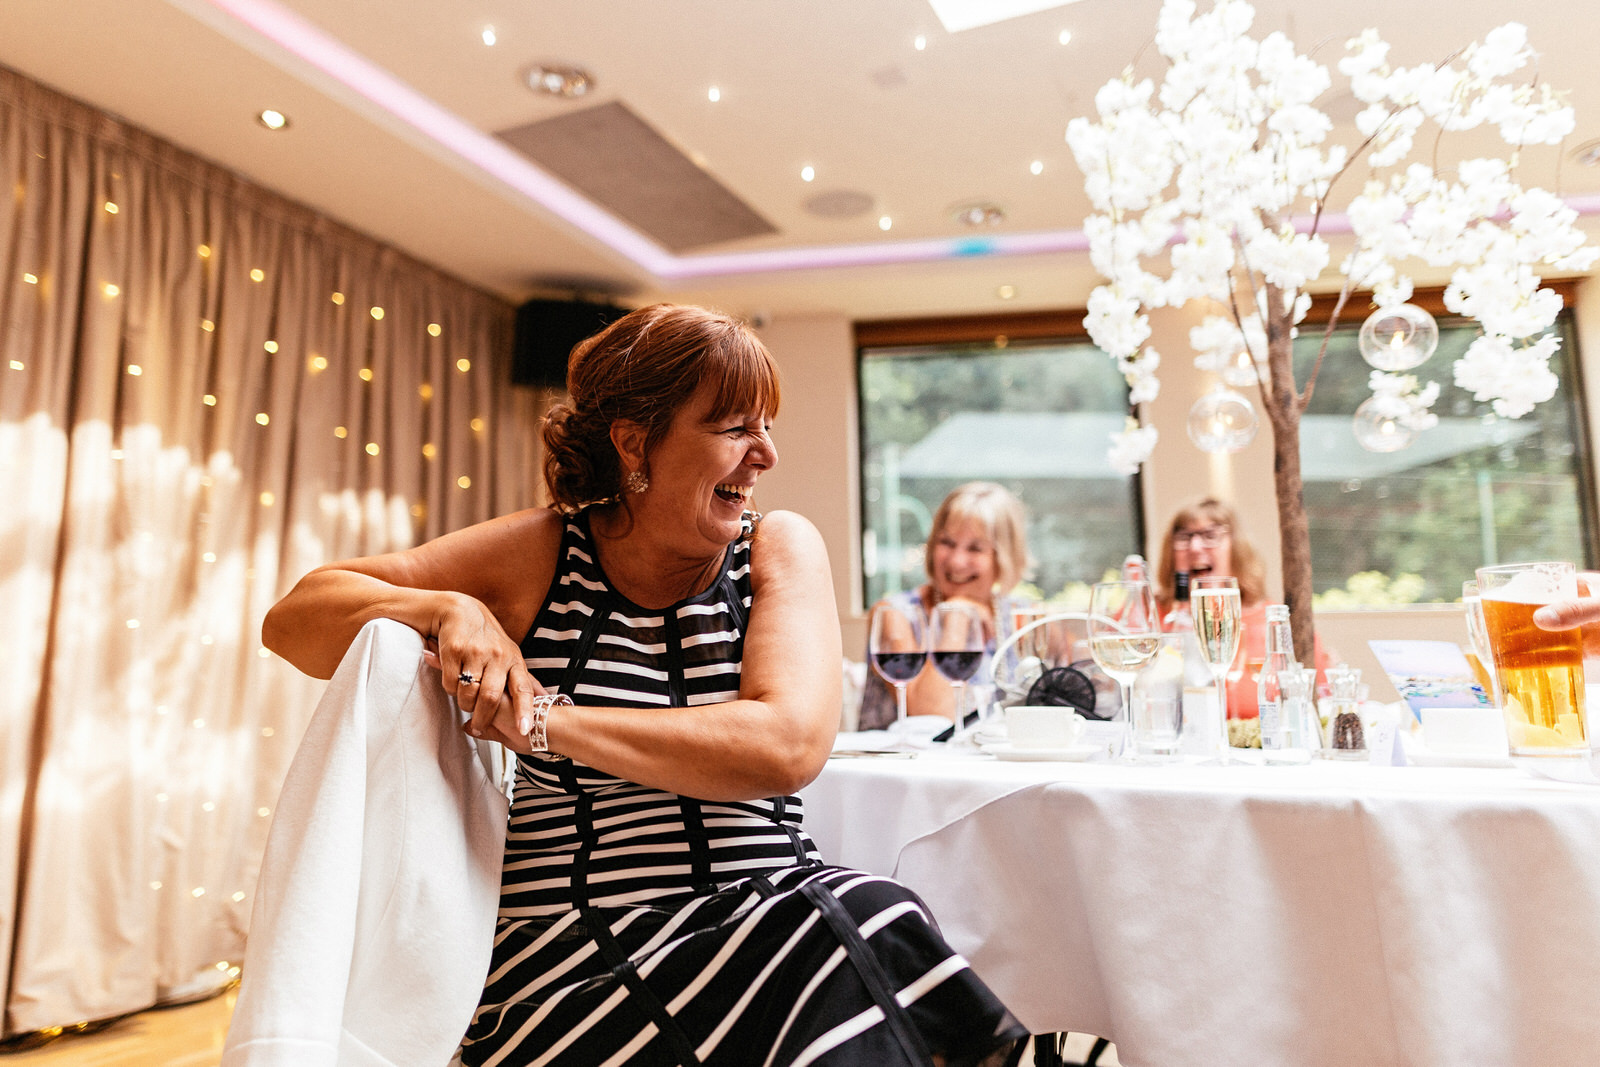 Moddershall-Oaks-Spa-Wedding-Photographer-048.jpg